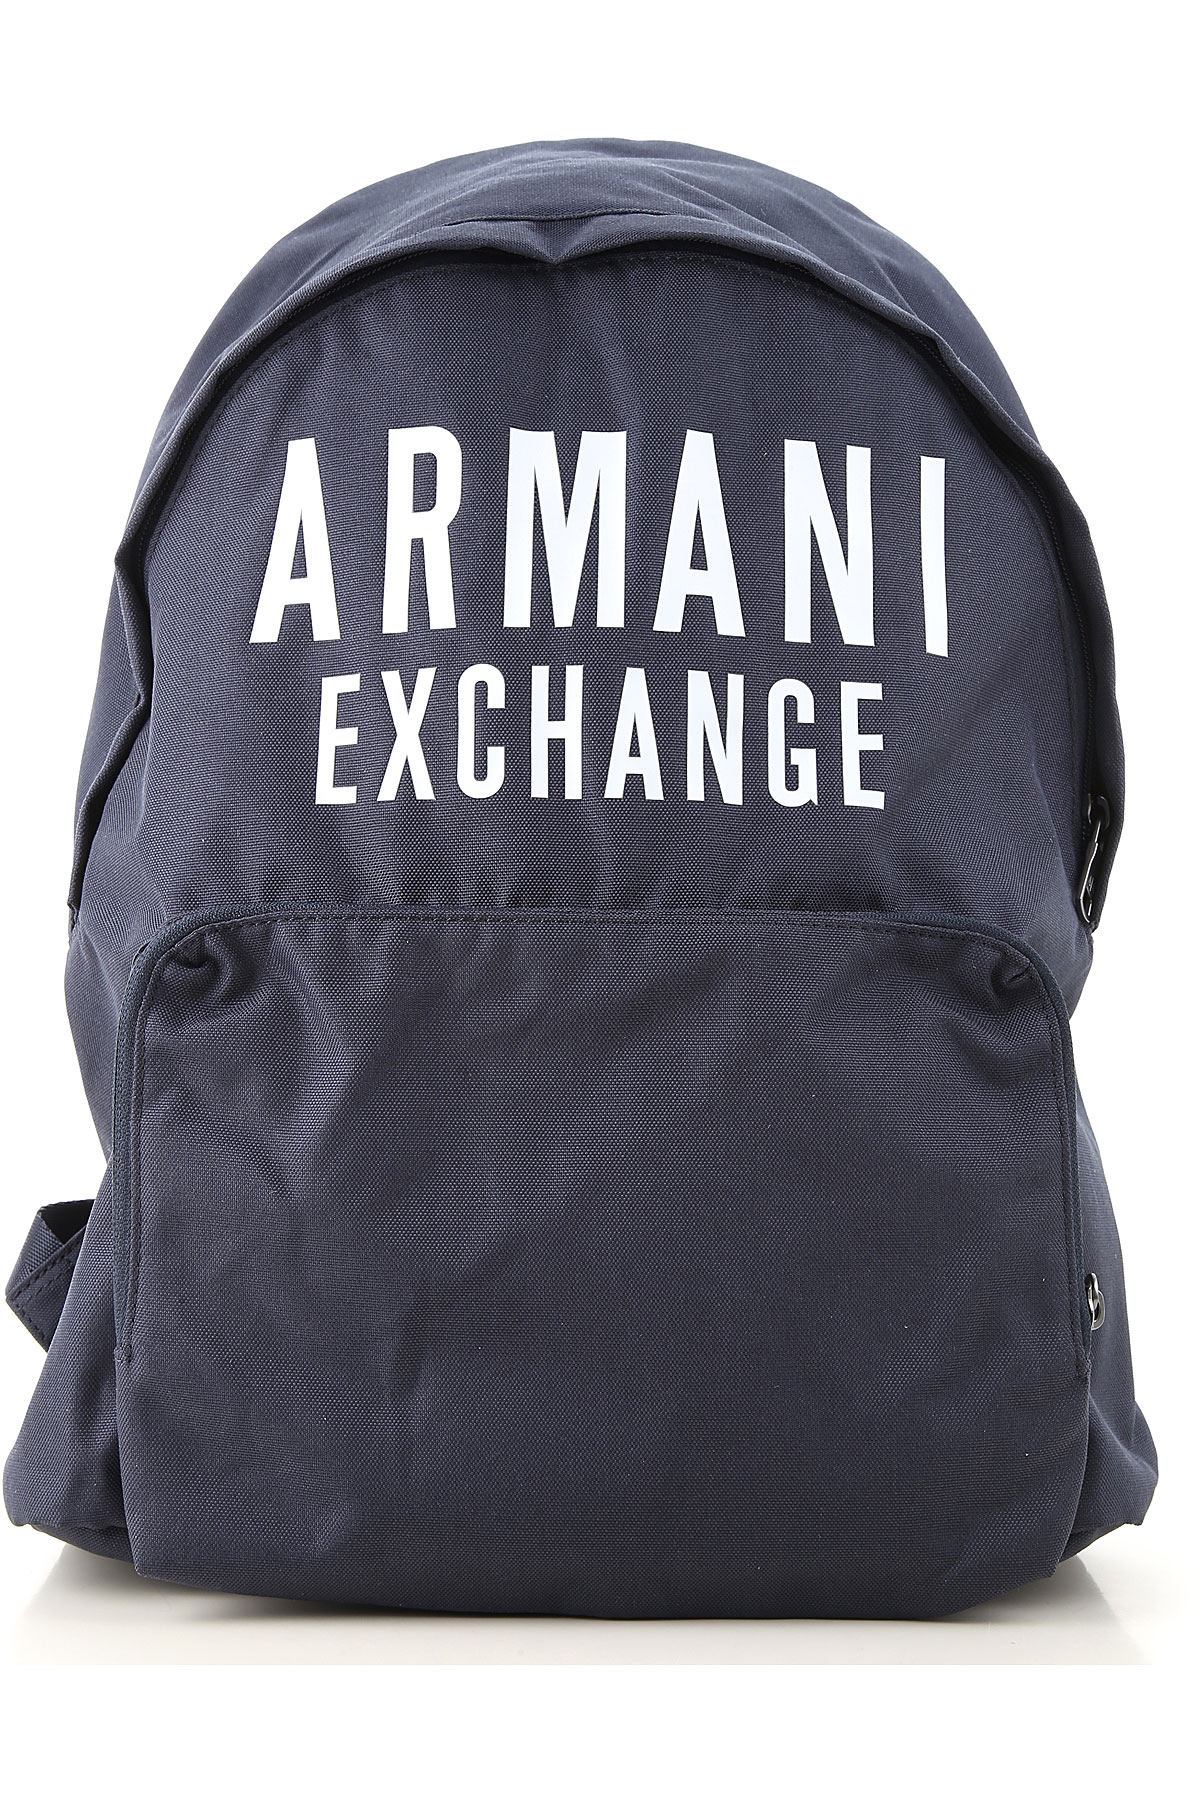 Armani Exchange Backpack for Men On Sale, Blue Navy, polyester, 2019